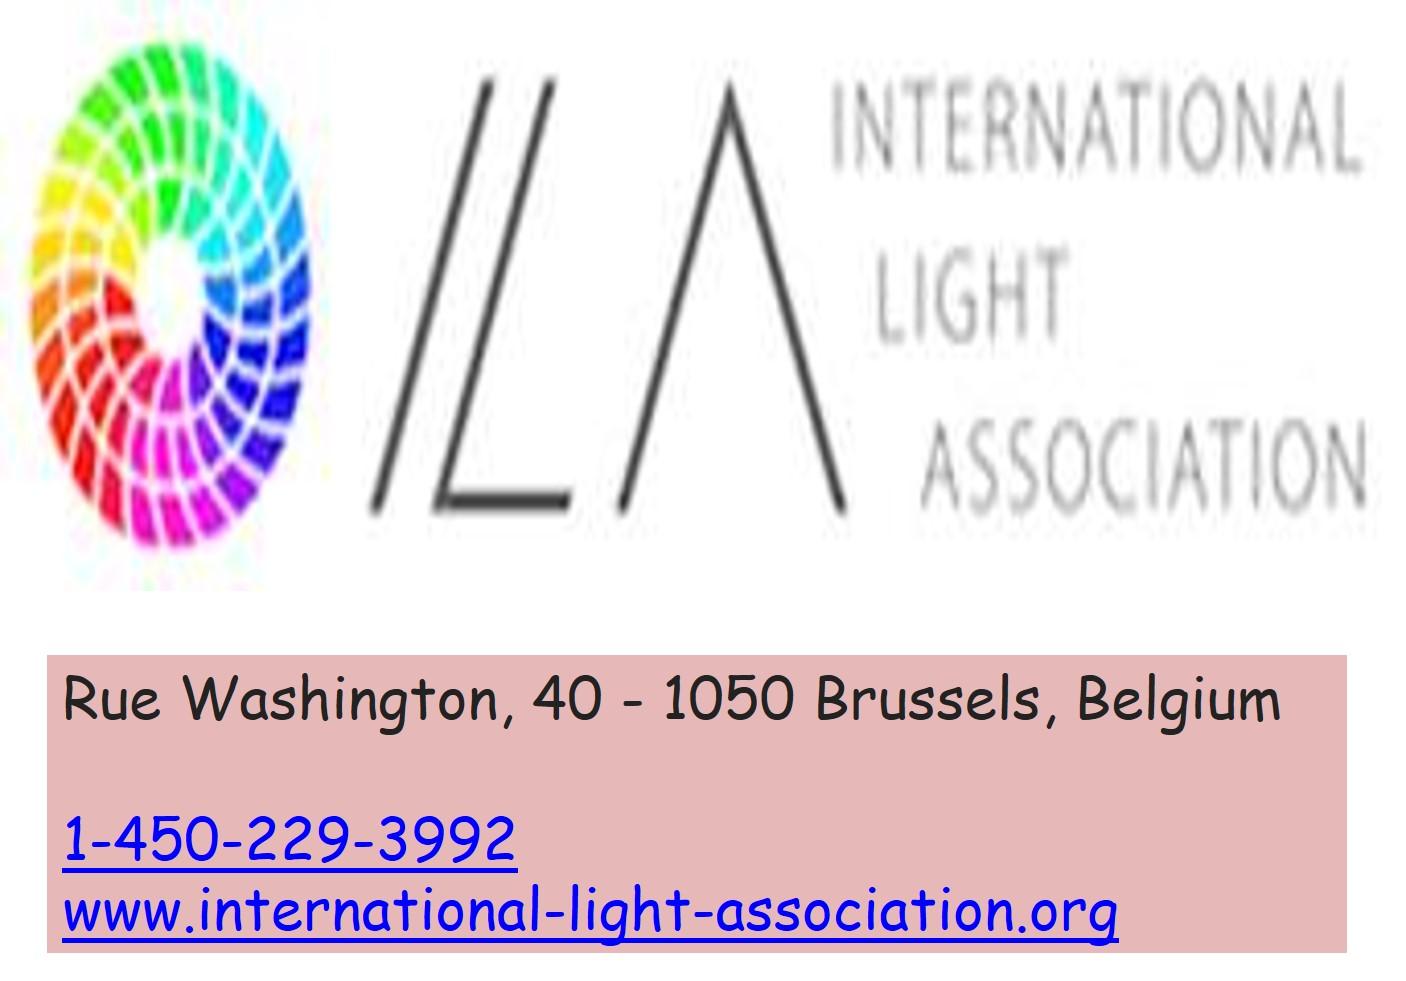 12ème Conférence Annuelle de l'ILA (International Light Association) : 30 avril / 3 mai 2015  -  TALLINN  -  ESTONIE